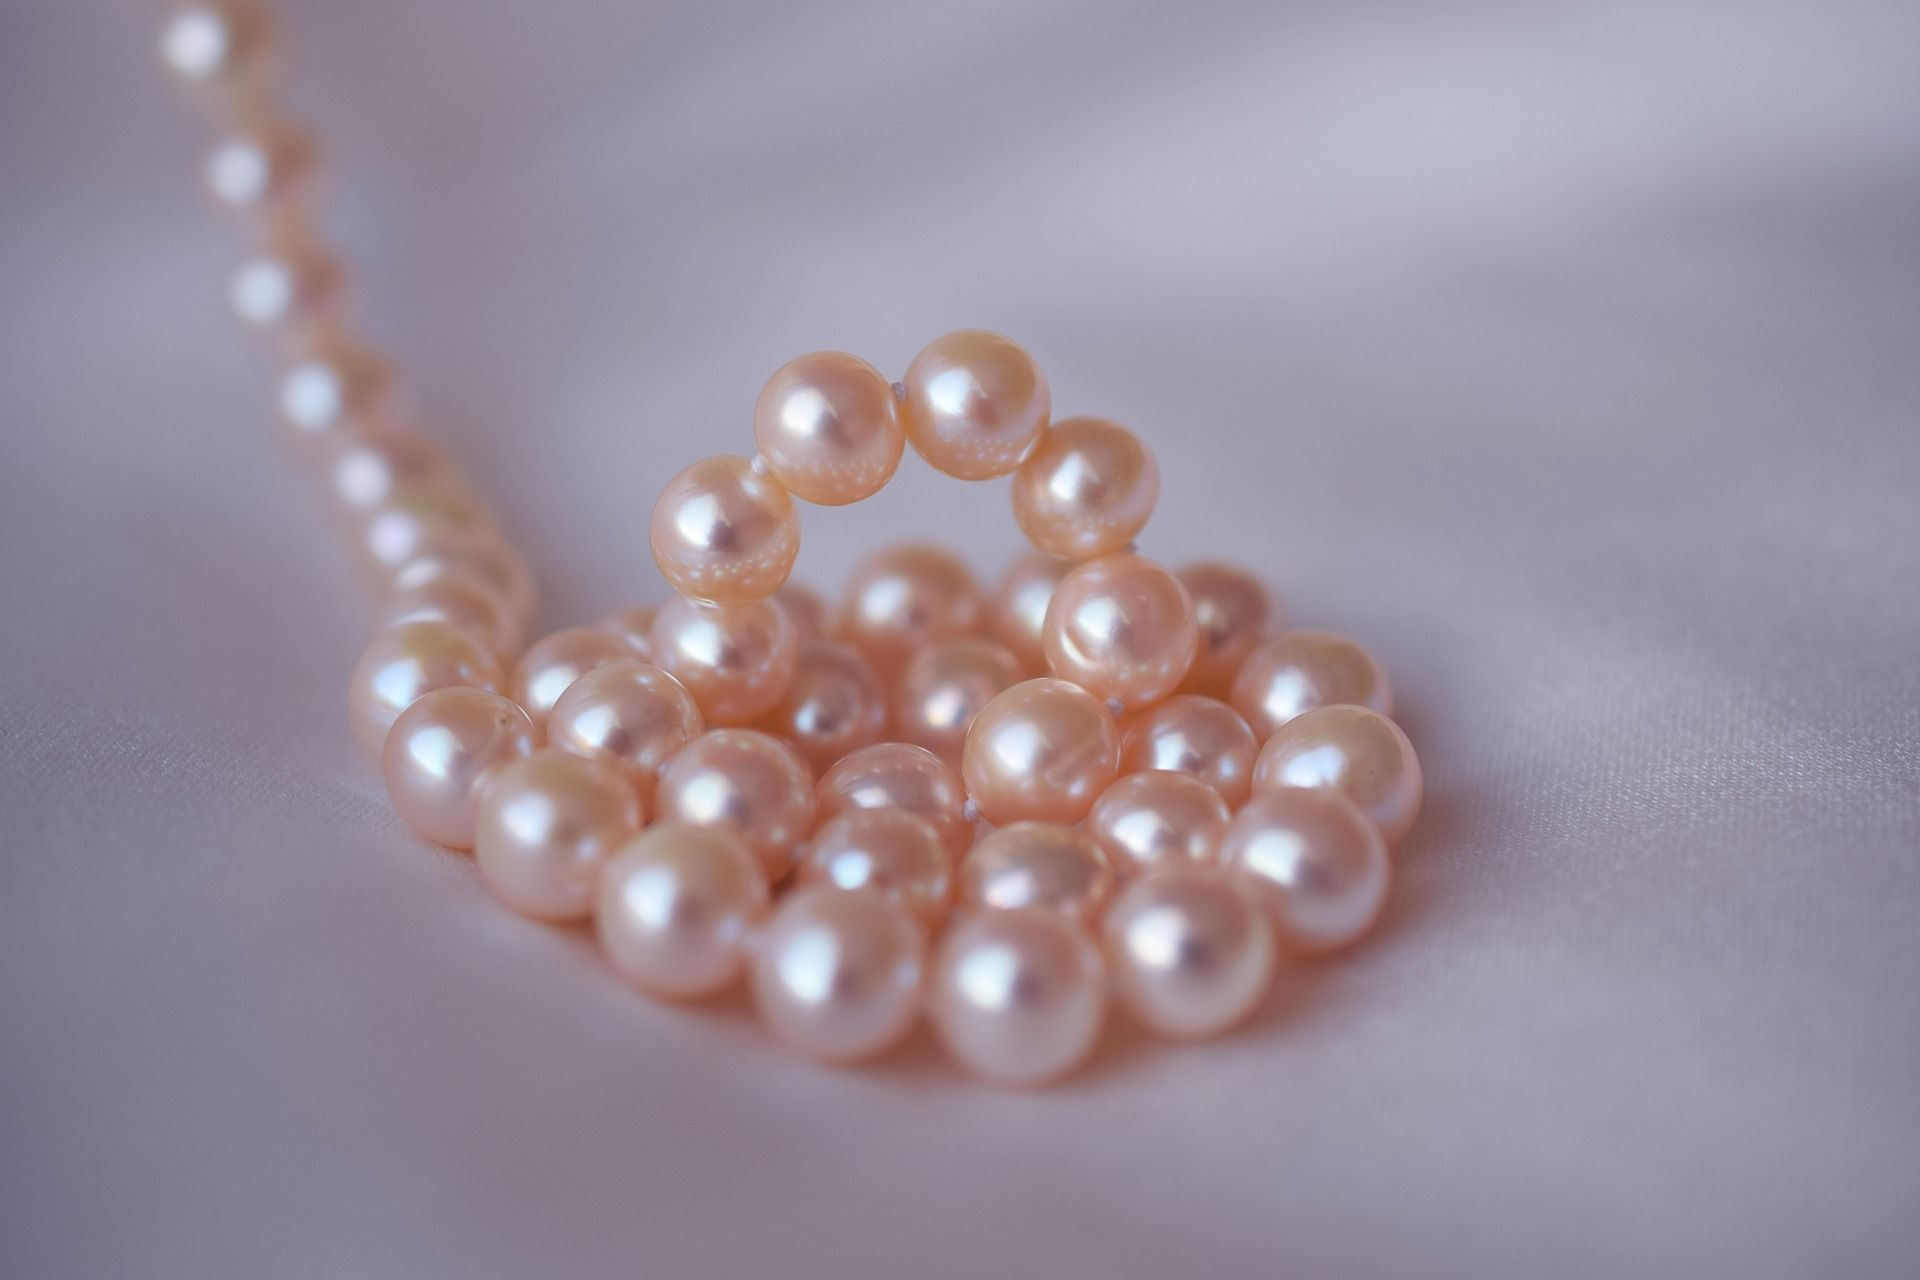 Mallorcan Pearls